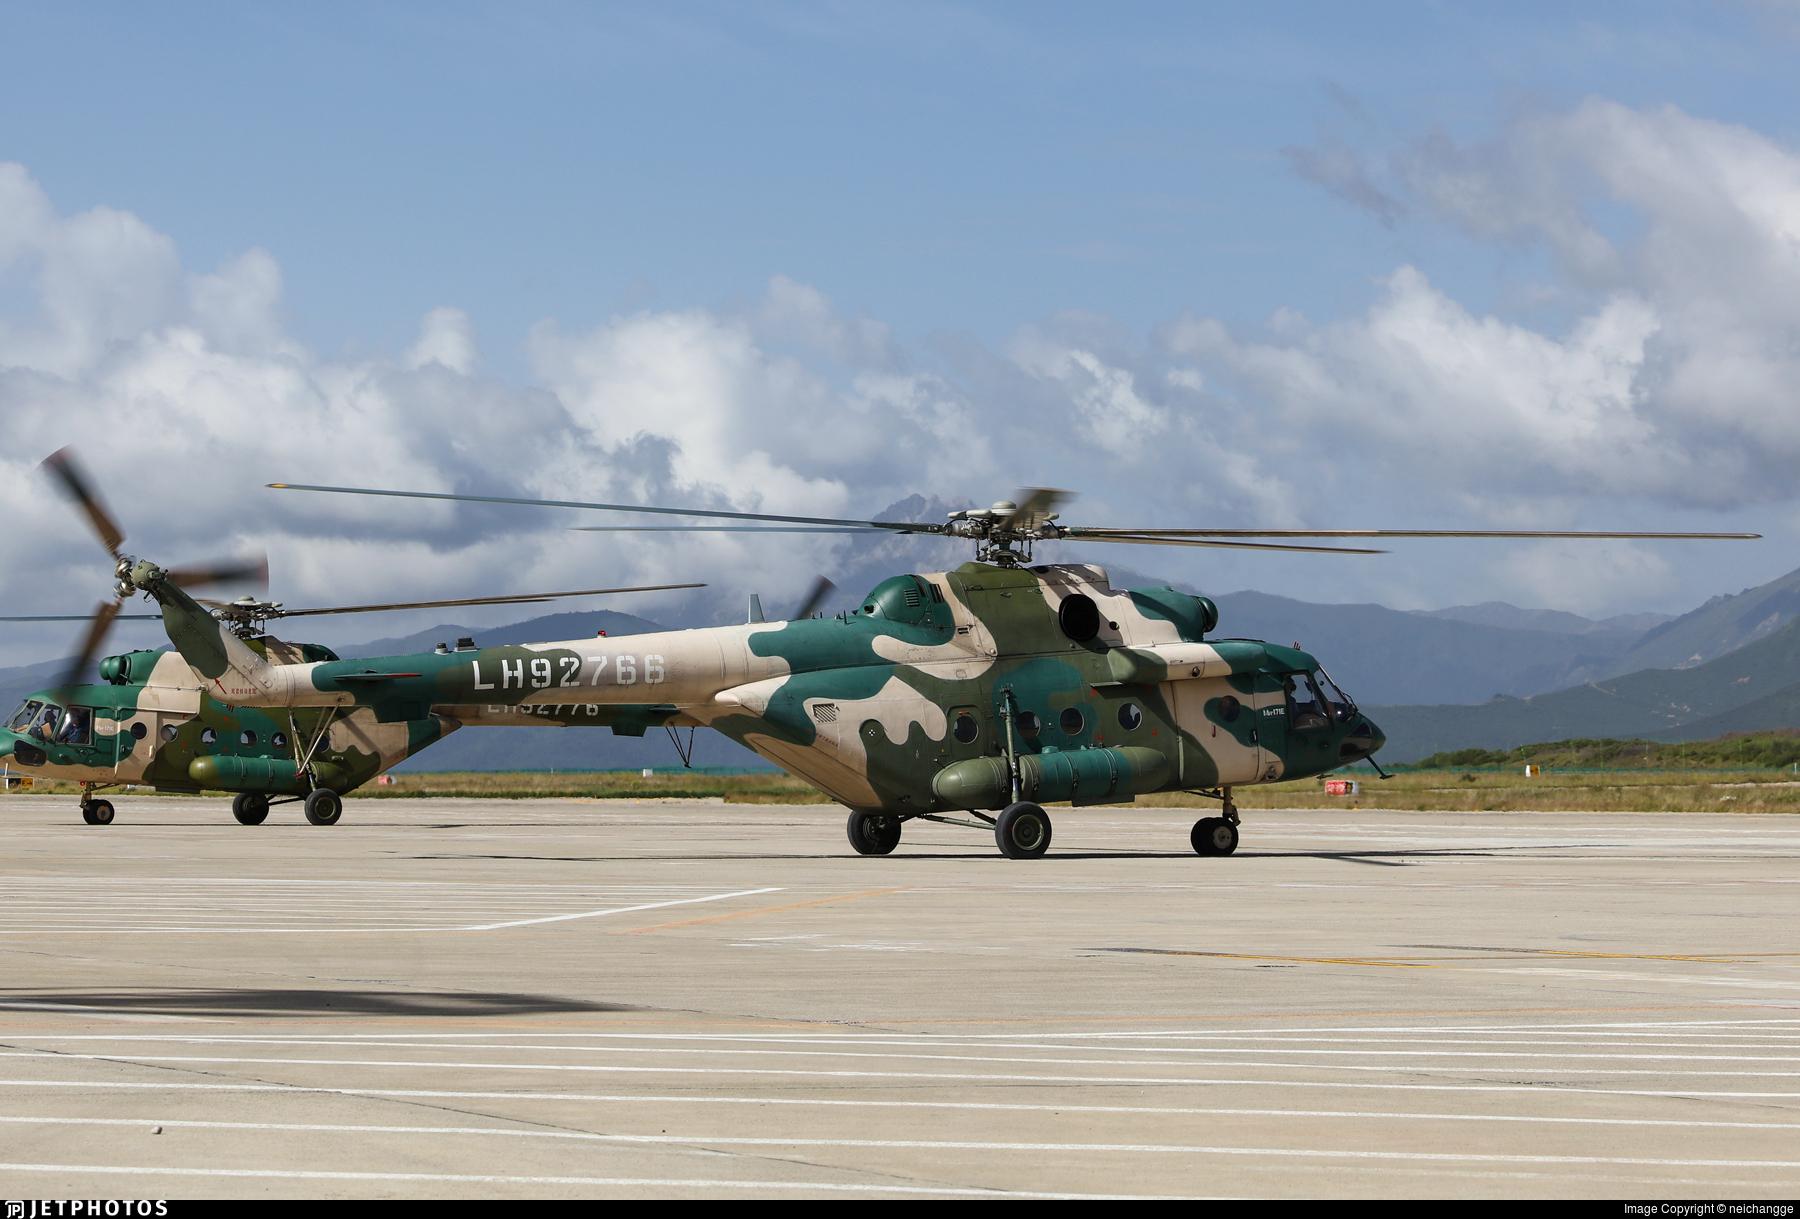 LH92766 - Mil Mi-171E Baikal - China - Army